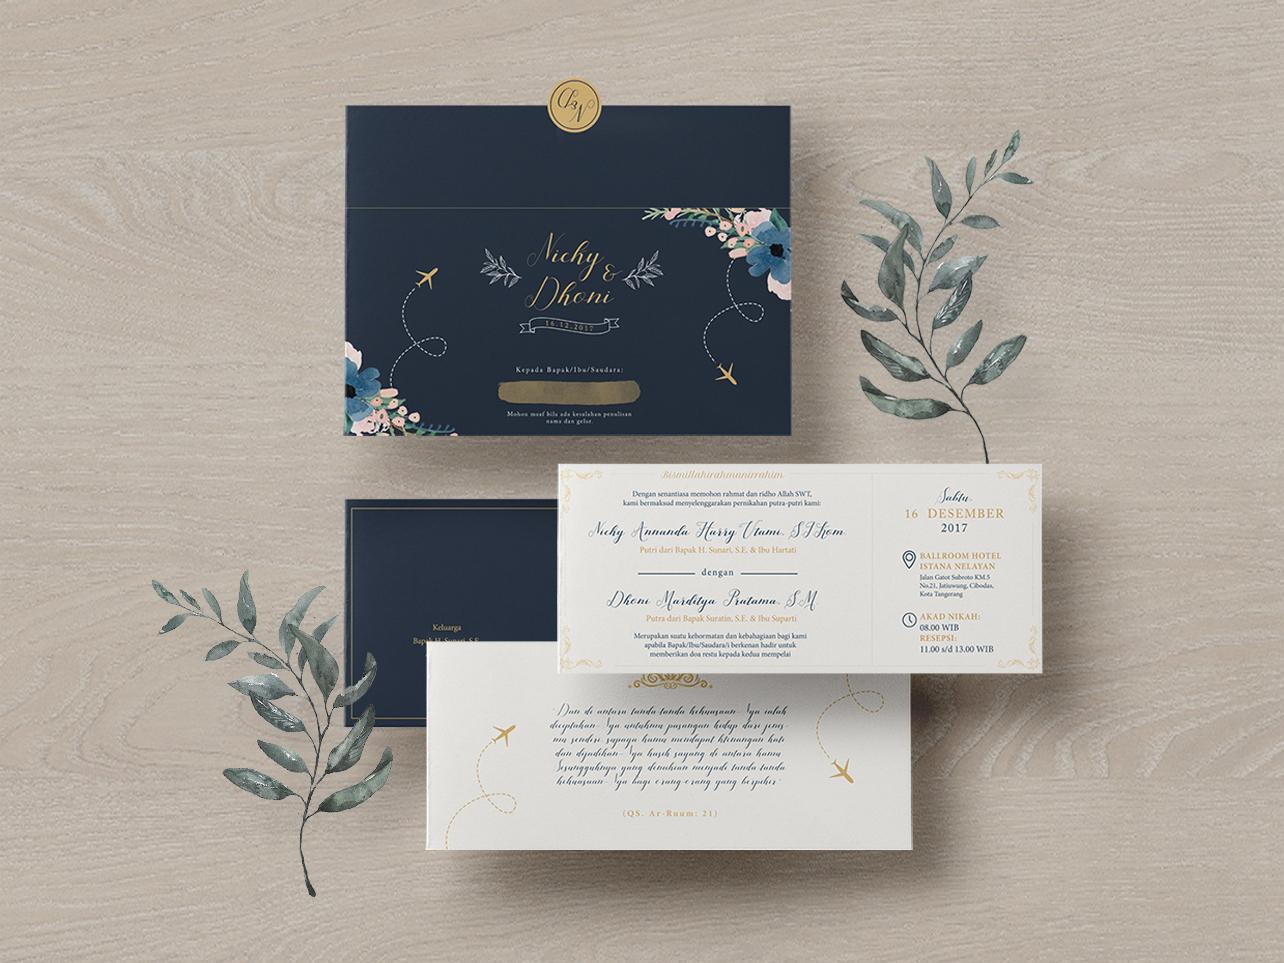 Nicky & Dhoni's Wedding Invitation illustration botanical wedding invite rustic wedding invitation invitation